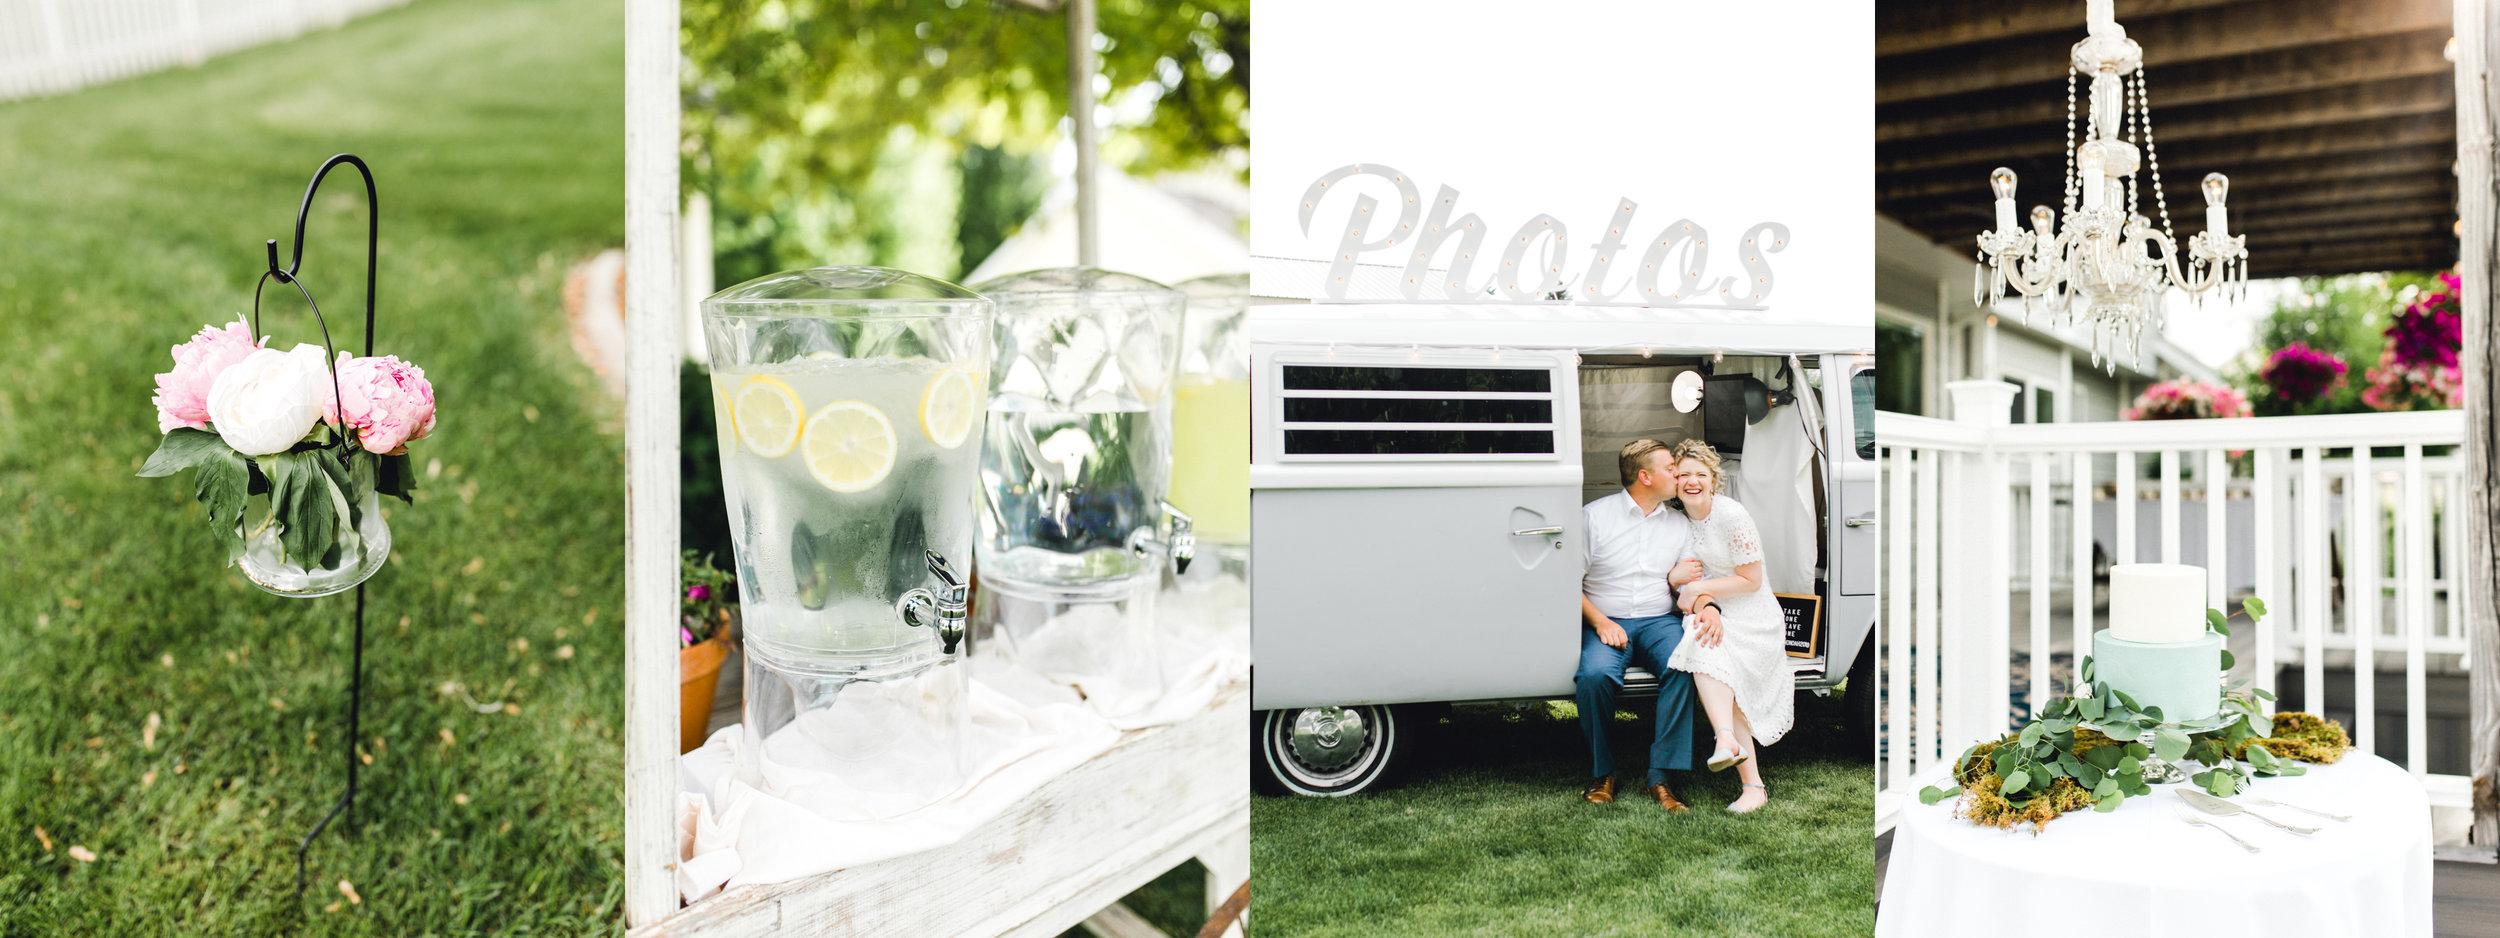 beautiful-outdoor-backyard-wedding-reception-anna-christine-photography-rexburg-idaho-14.jpg